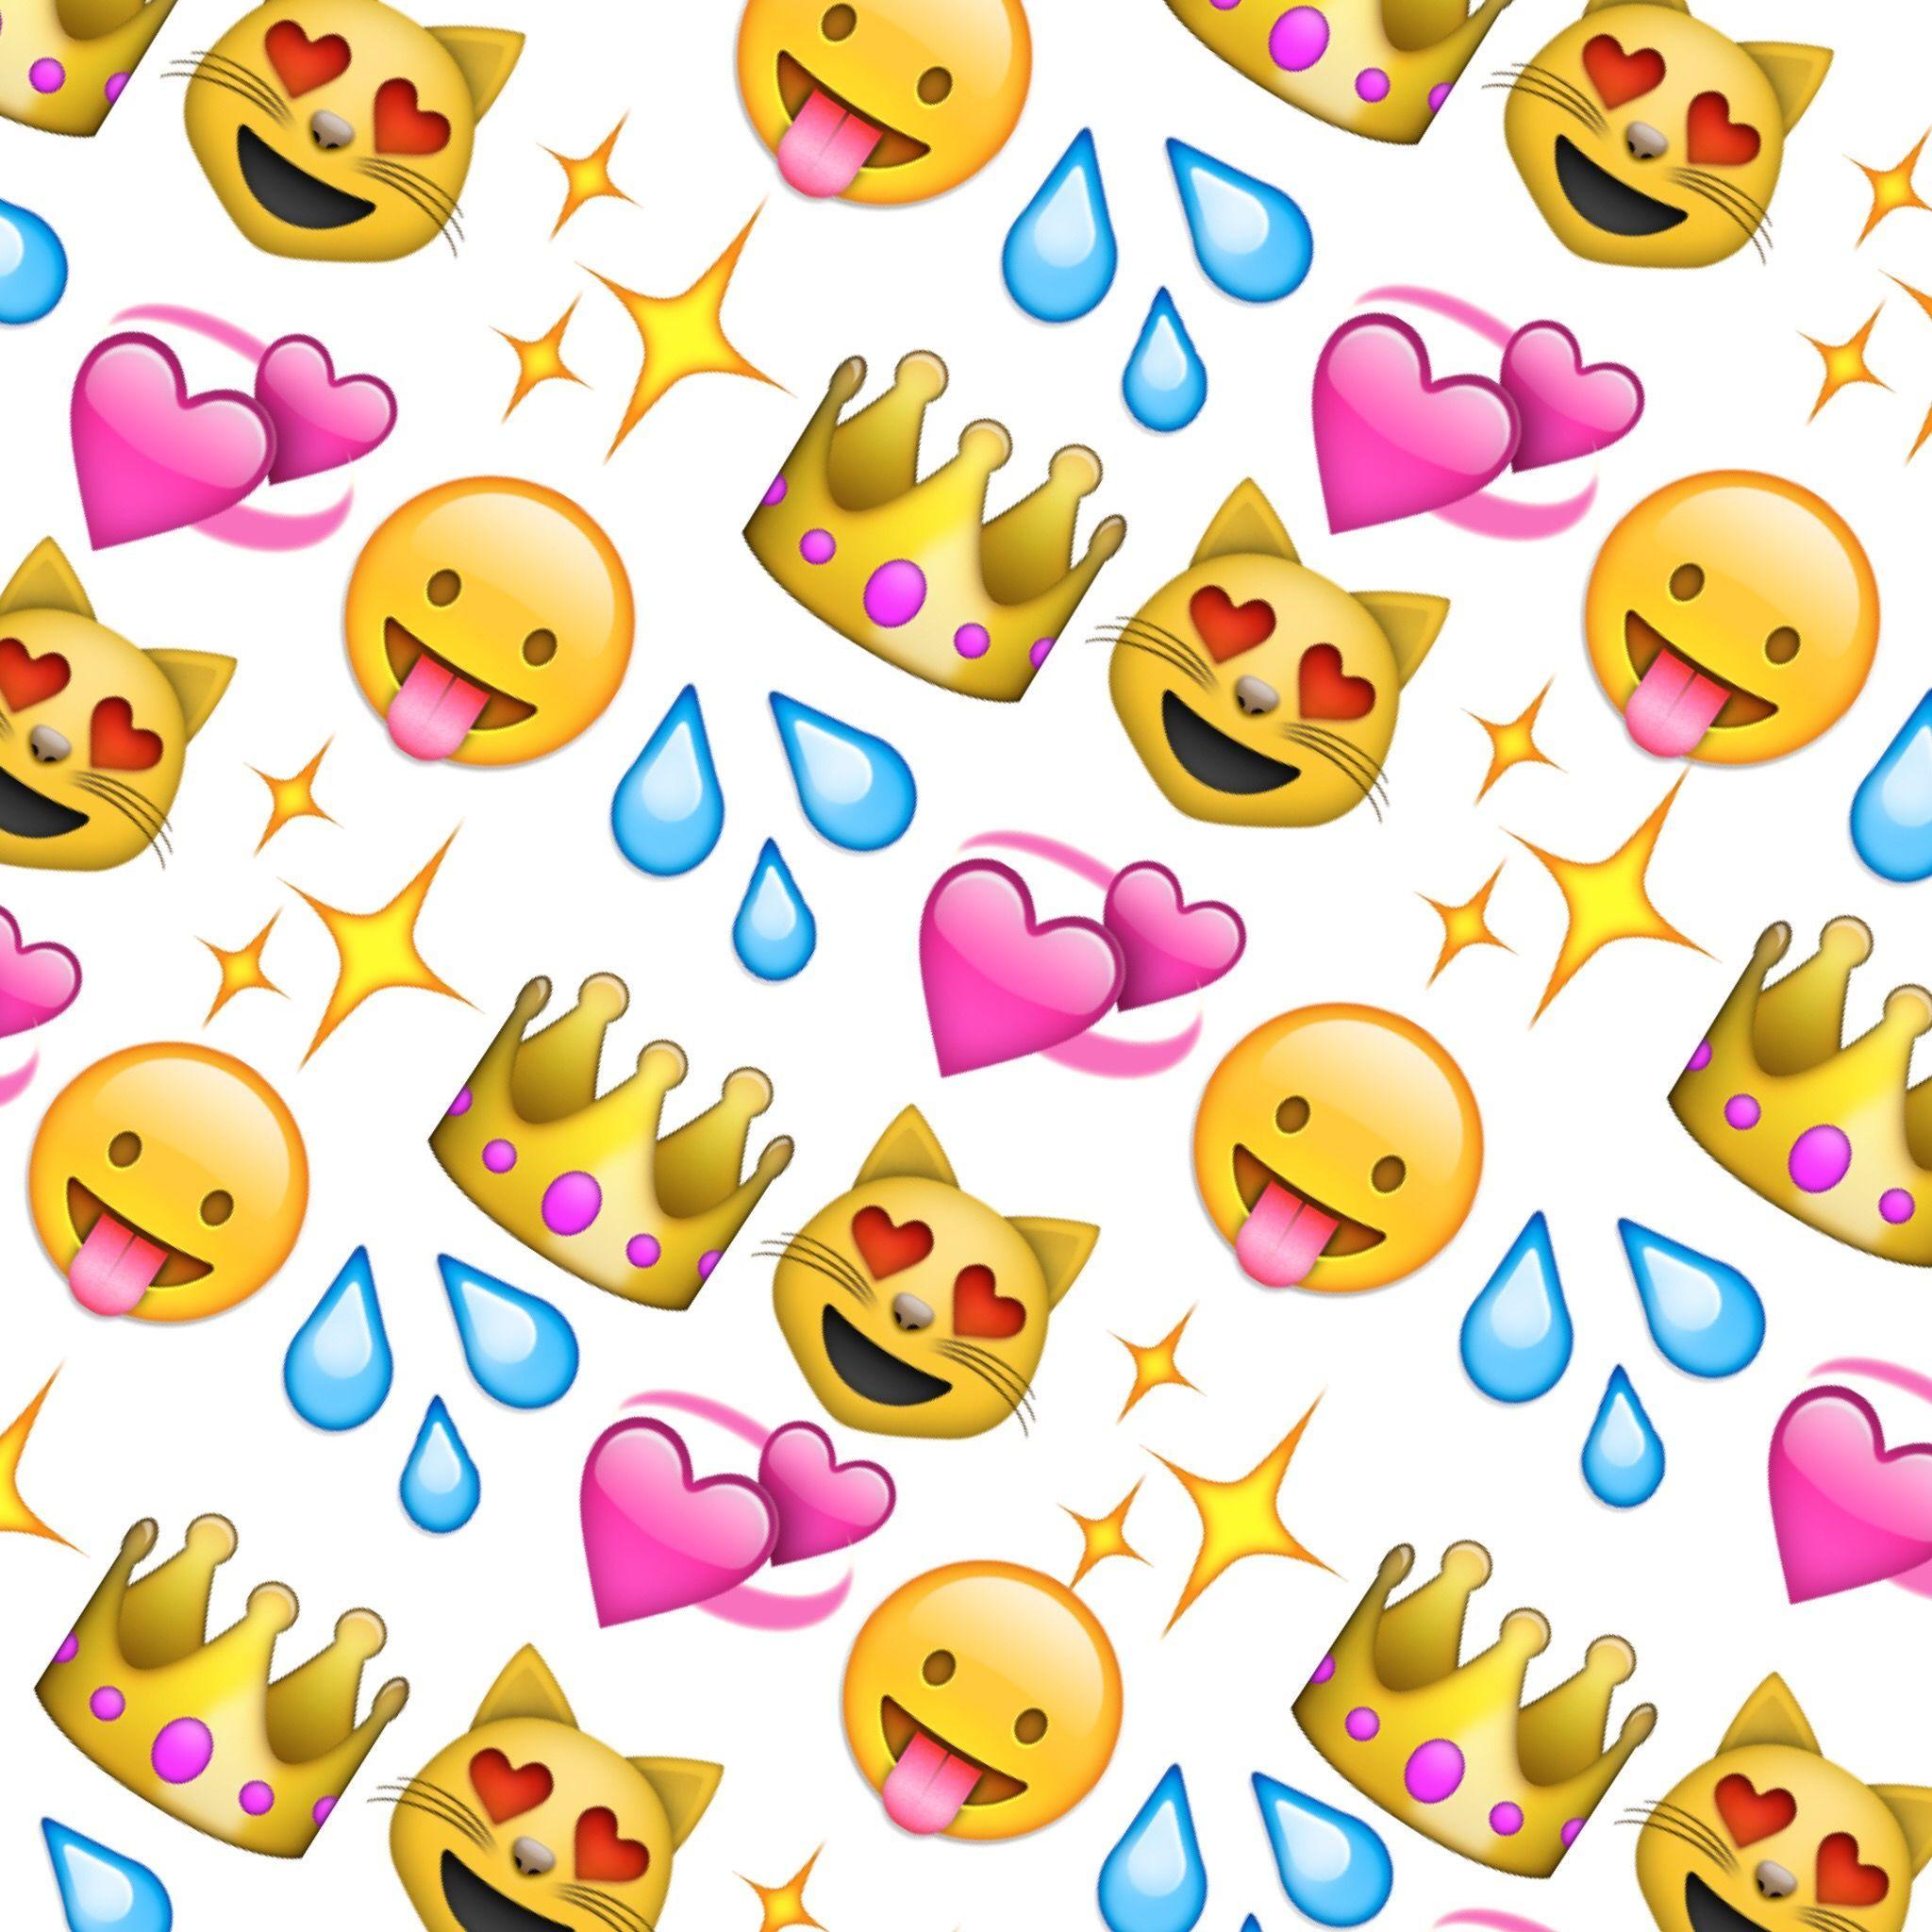 Pin By Tenugu On Wallpaper Pinterest Emoji Wallpaper